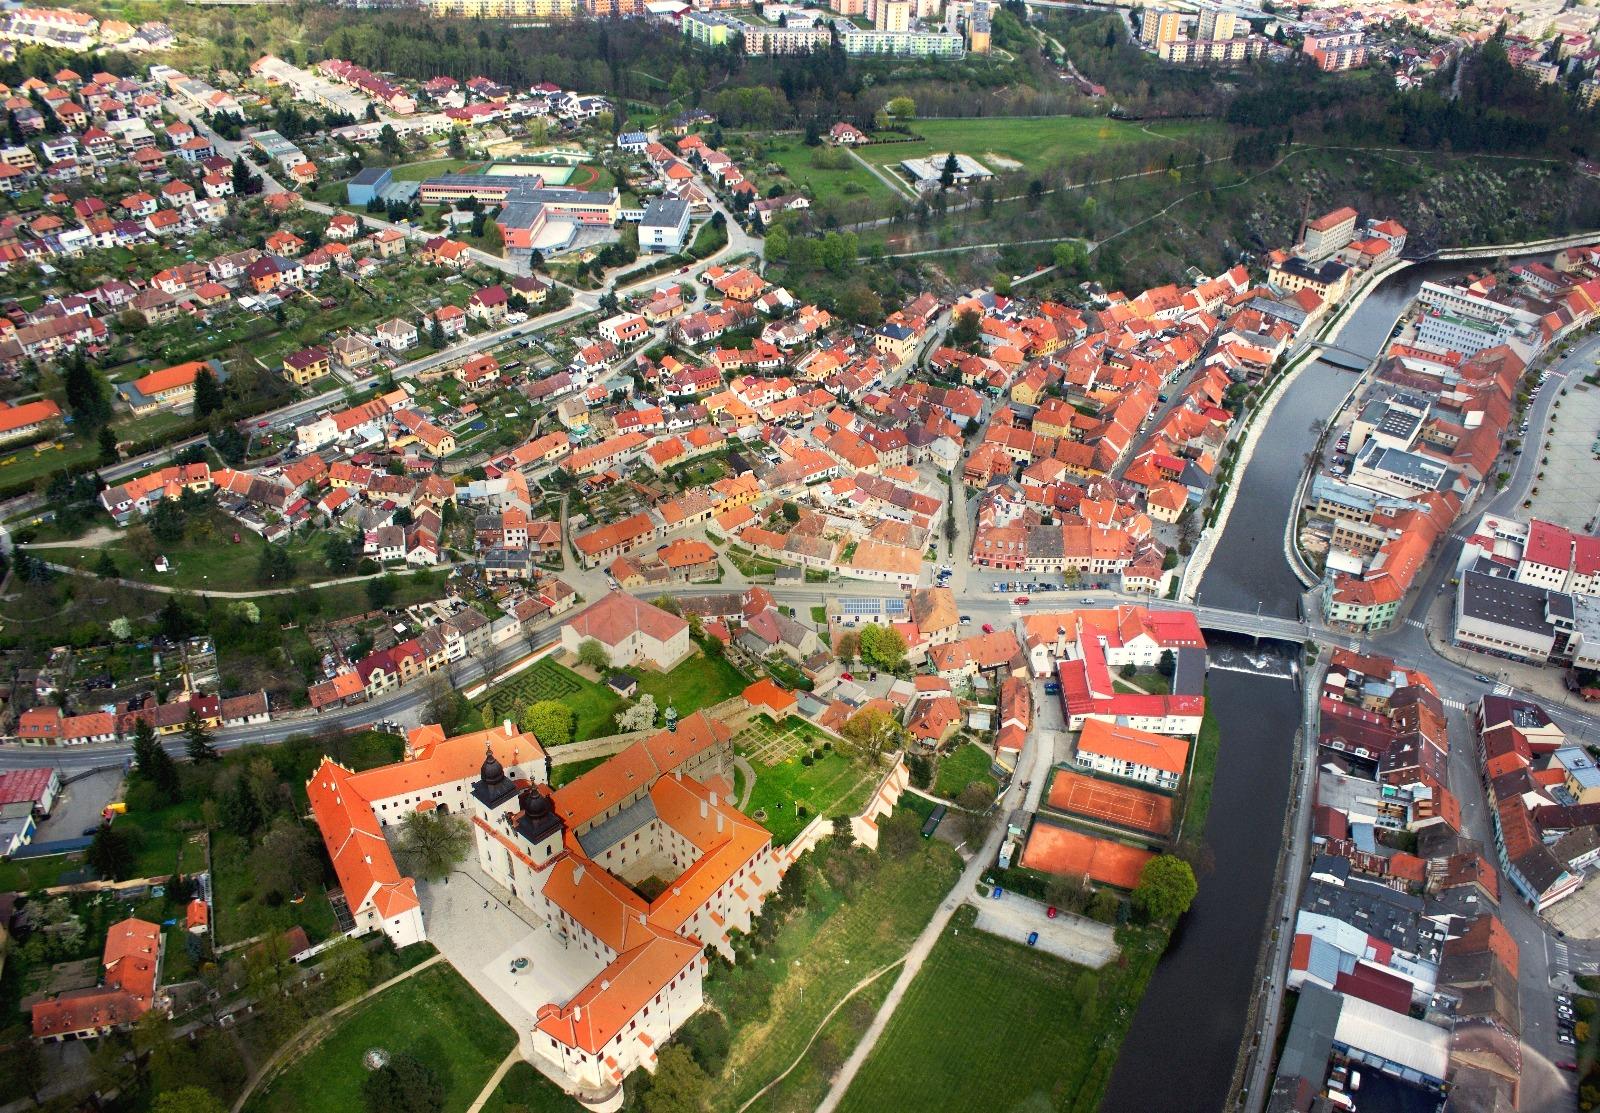 The Jewish Quarter and Jewish Cemetery